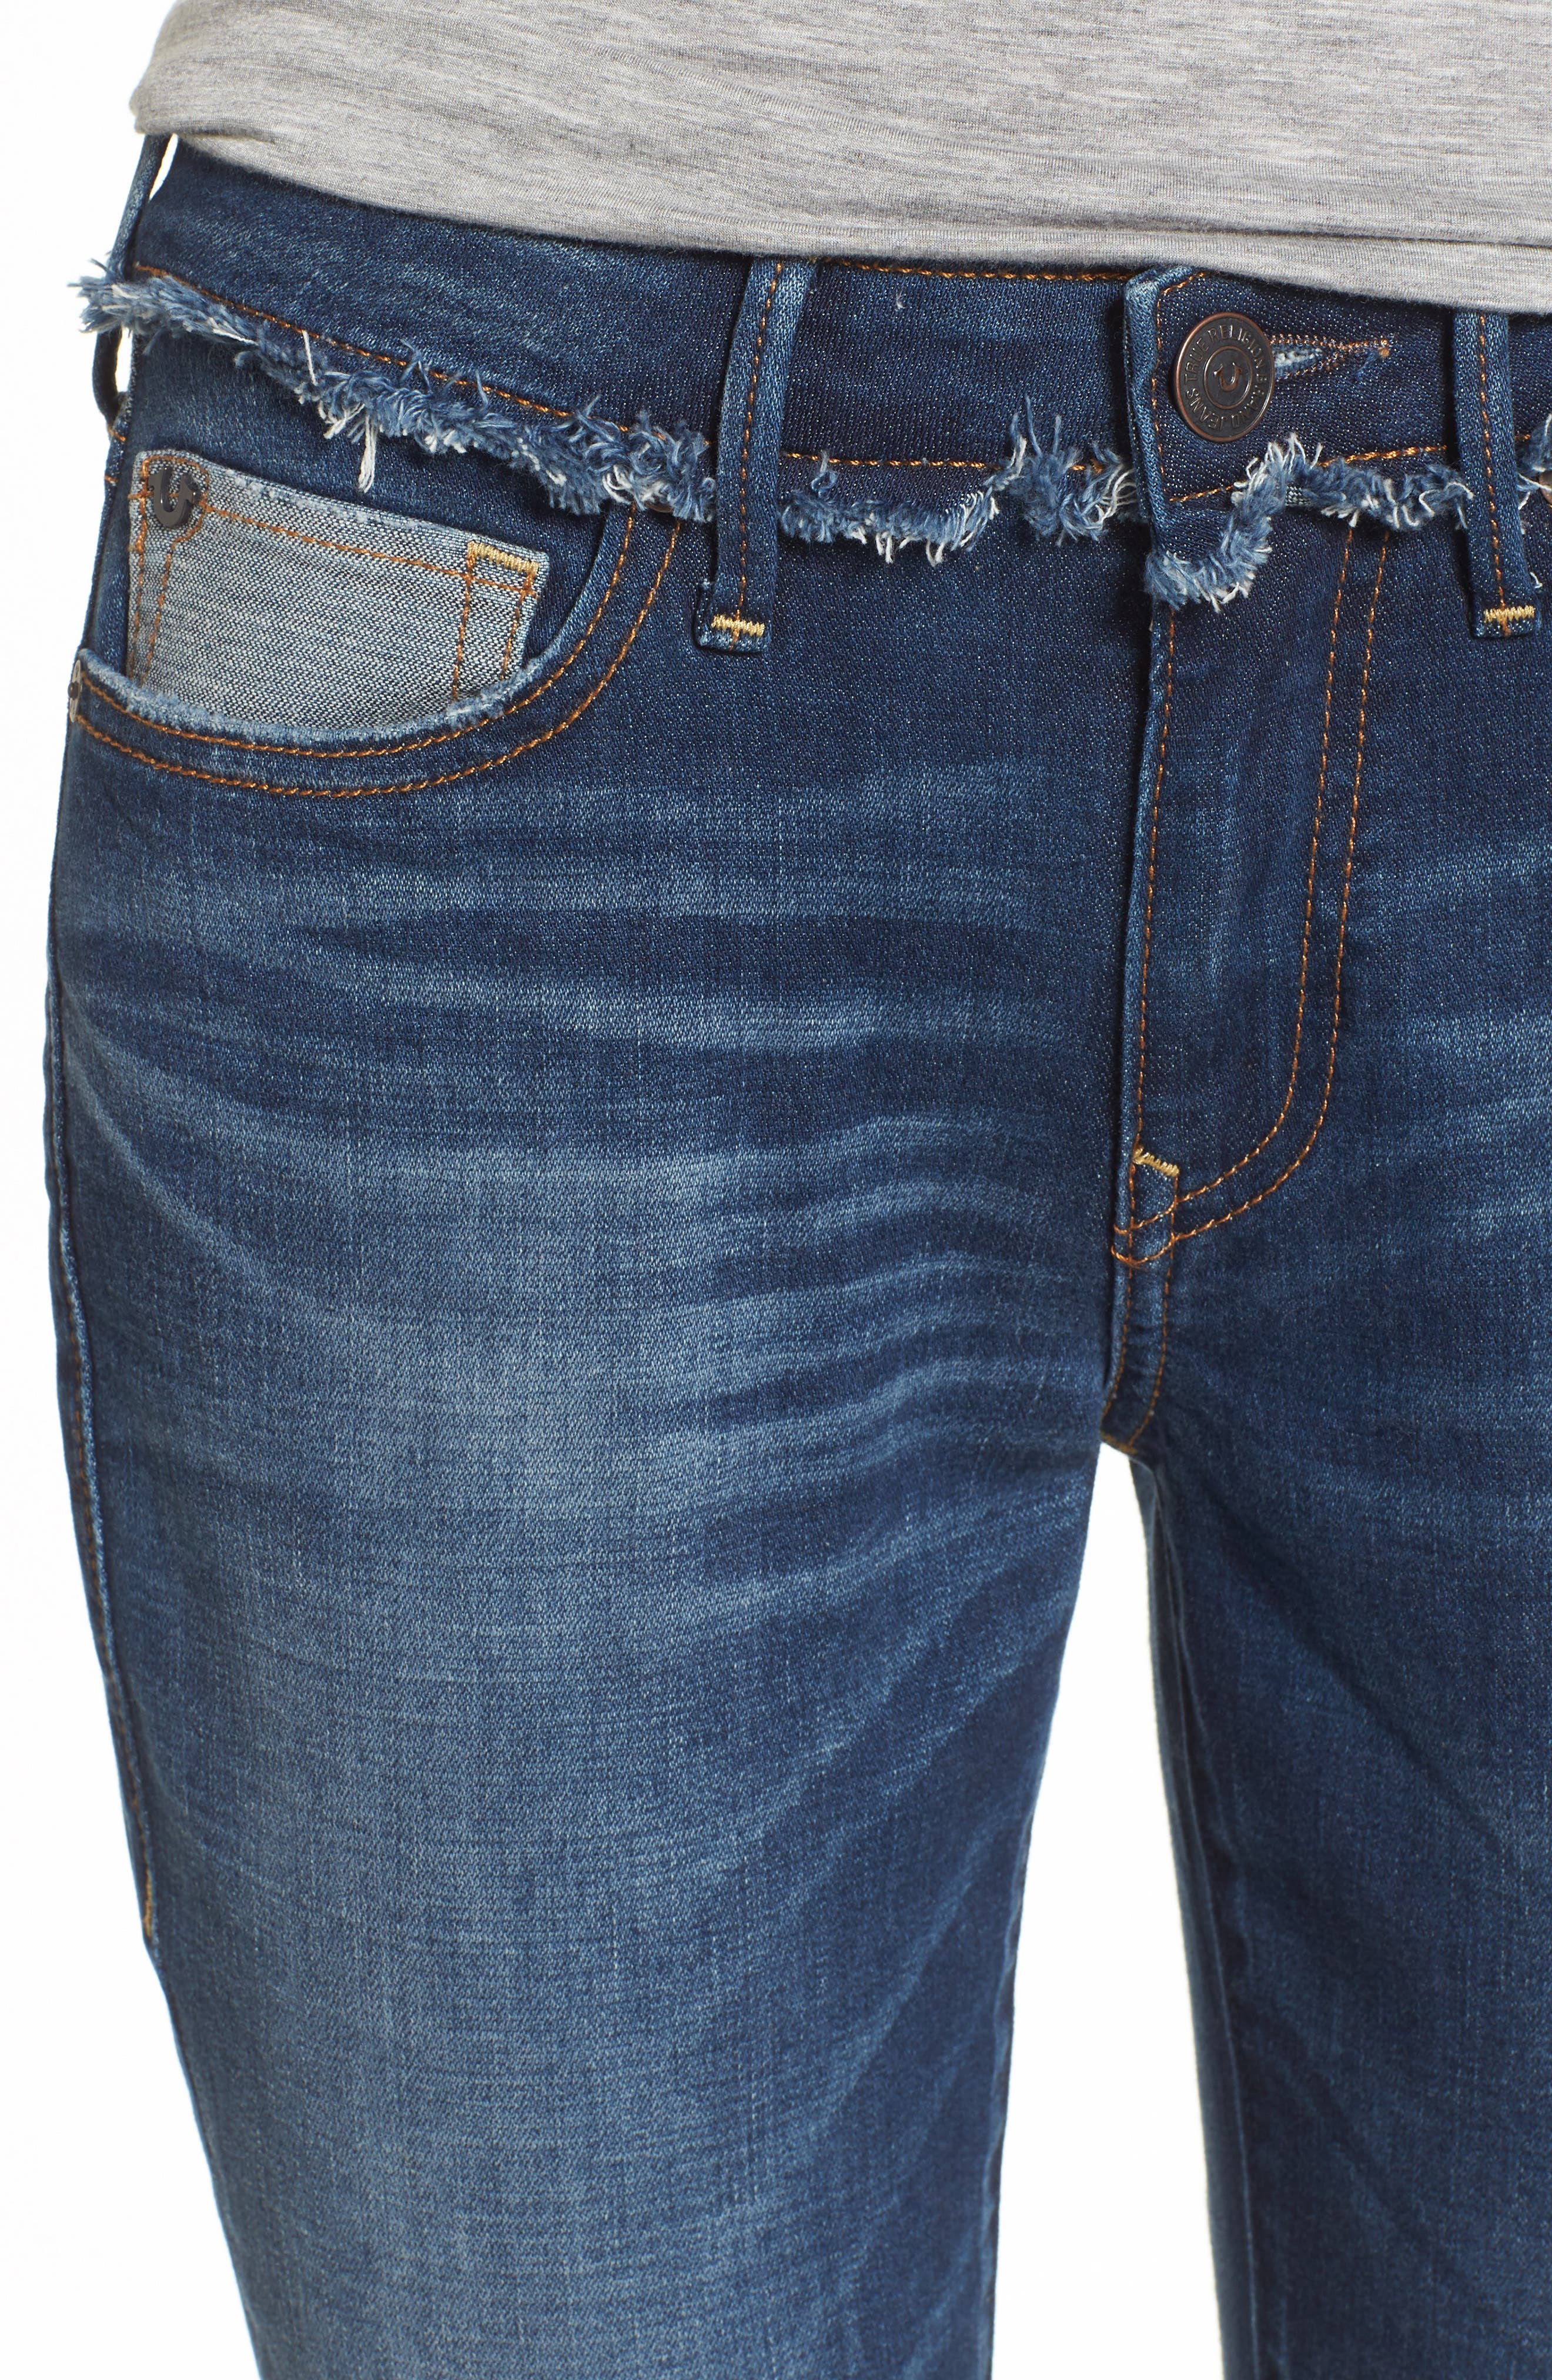 Alternate Image 4  - True Religion Brand Jeans Jennie Deconstructed Skinny Jeans (Broken Record)